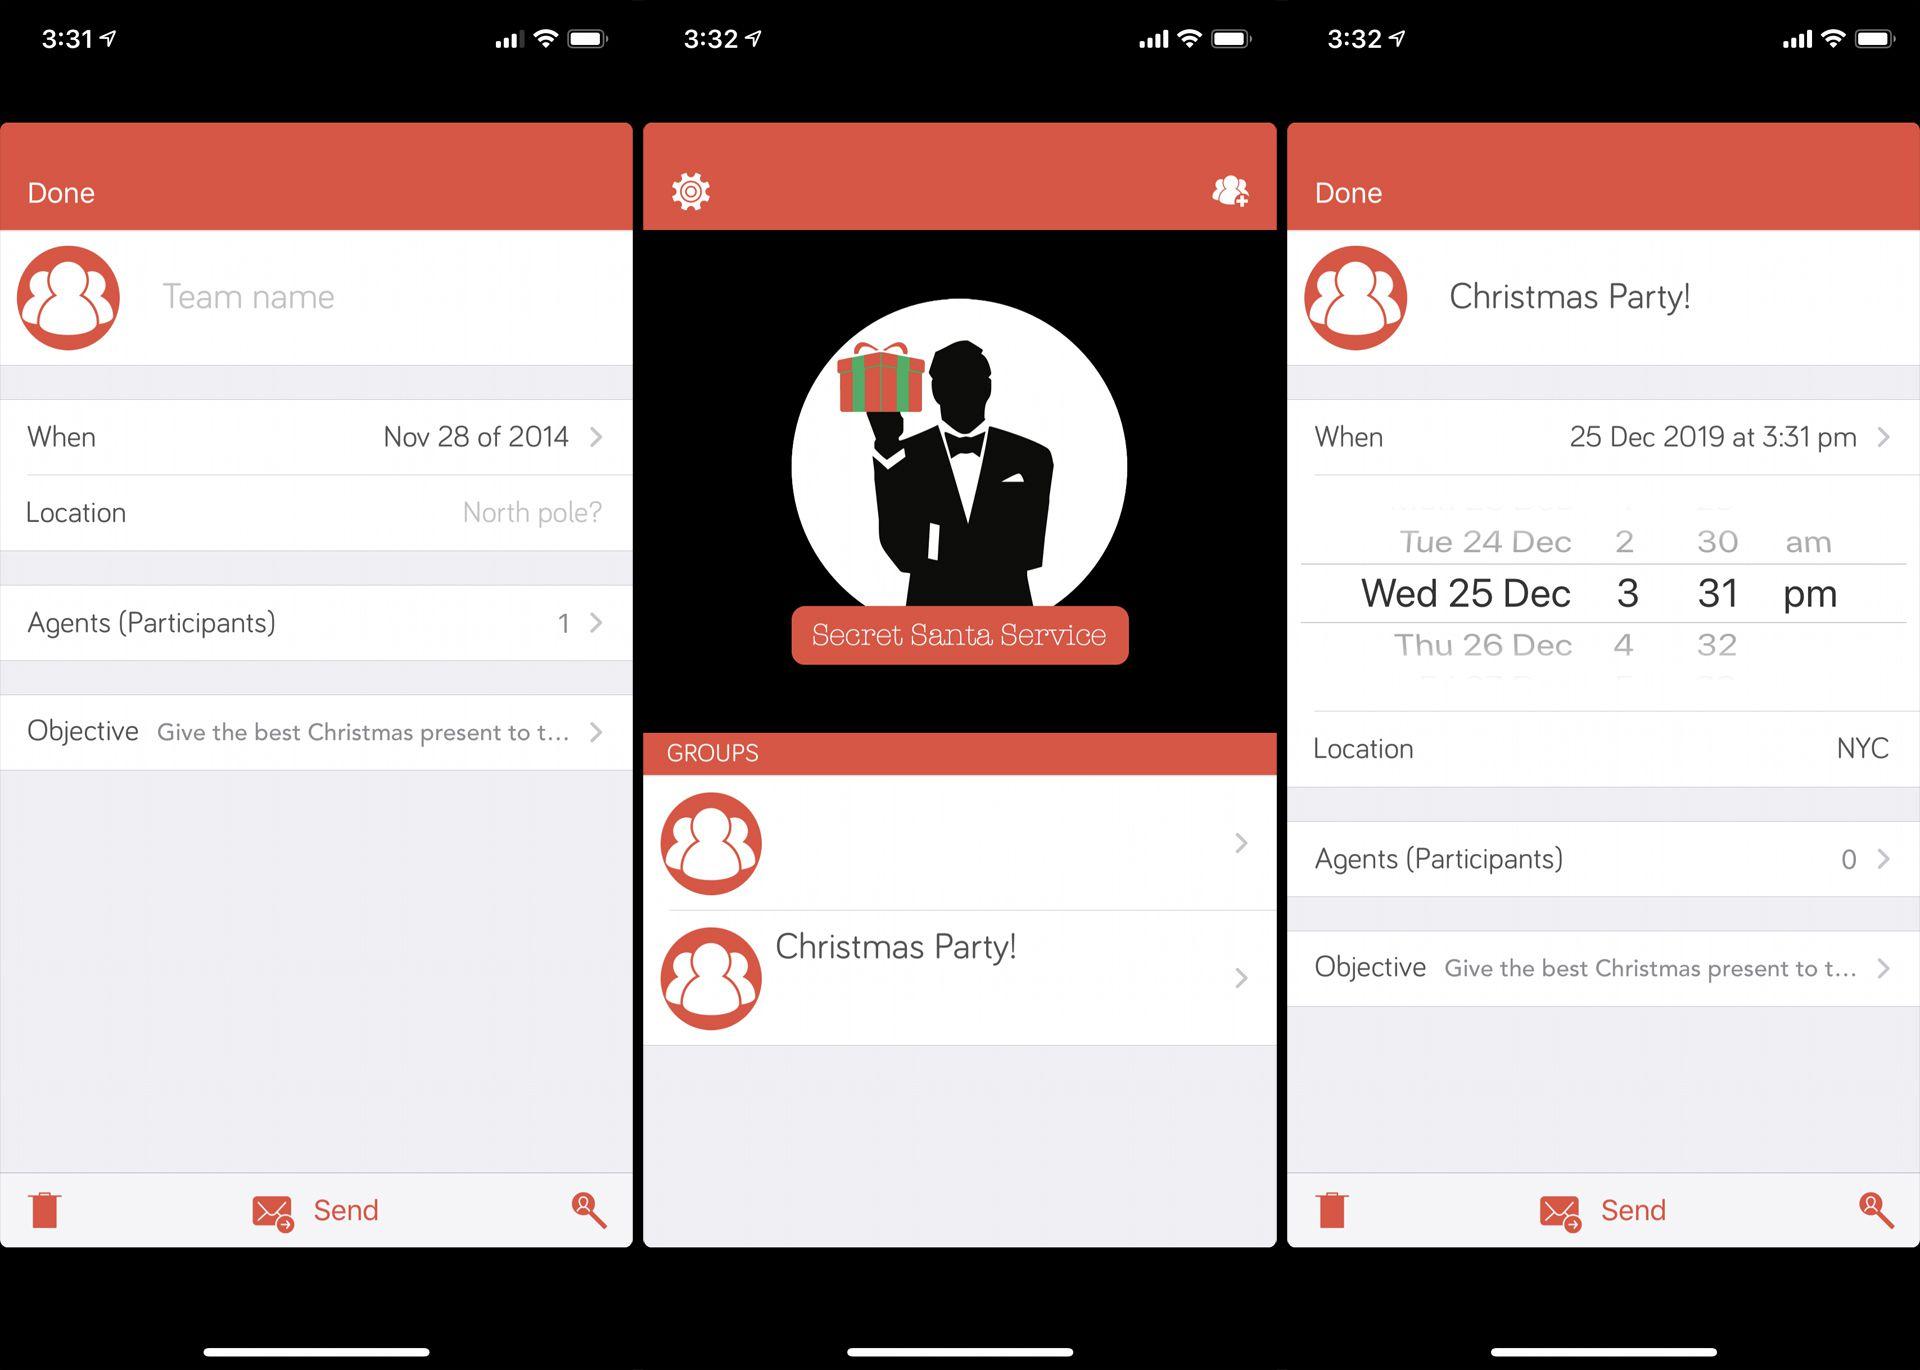 Secret Santa Service app on iPhone